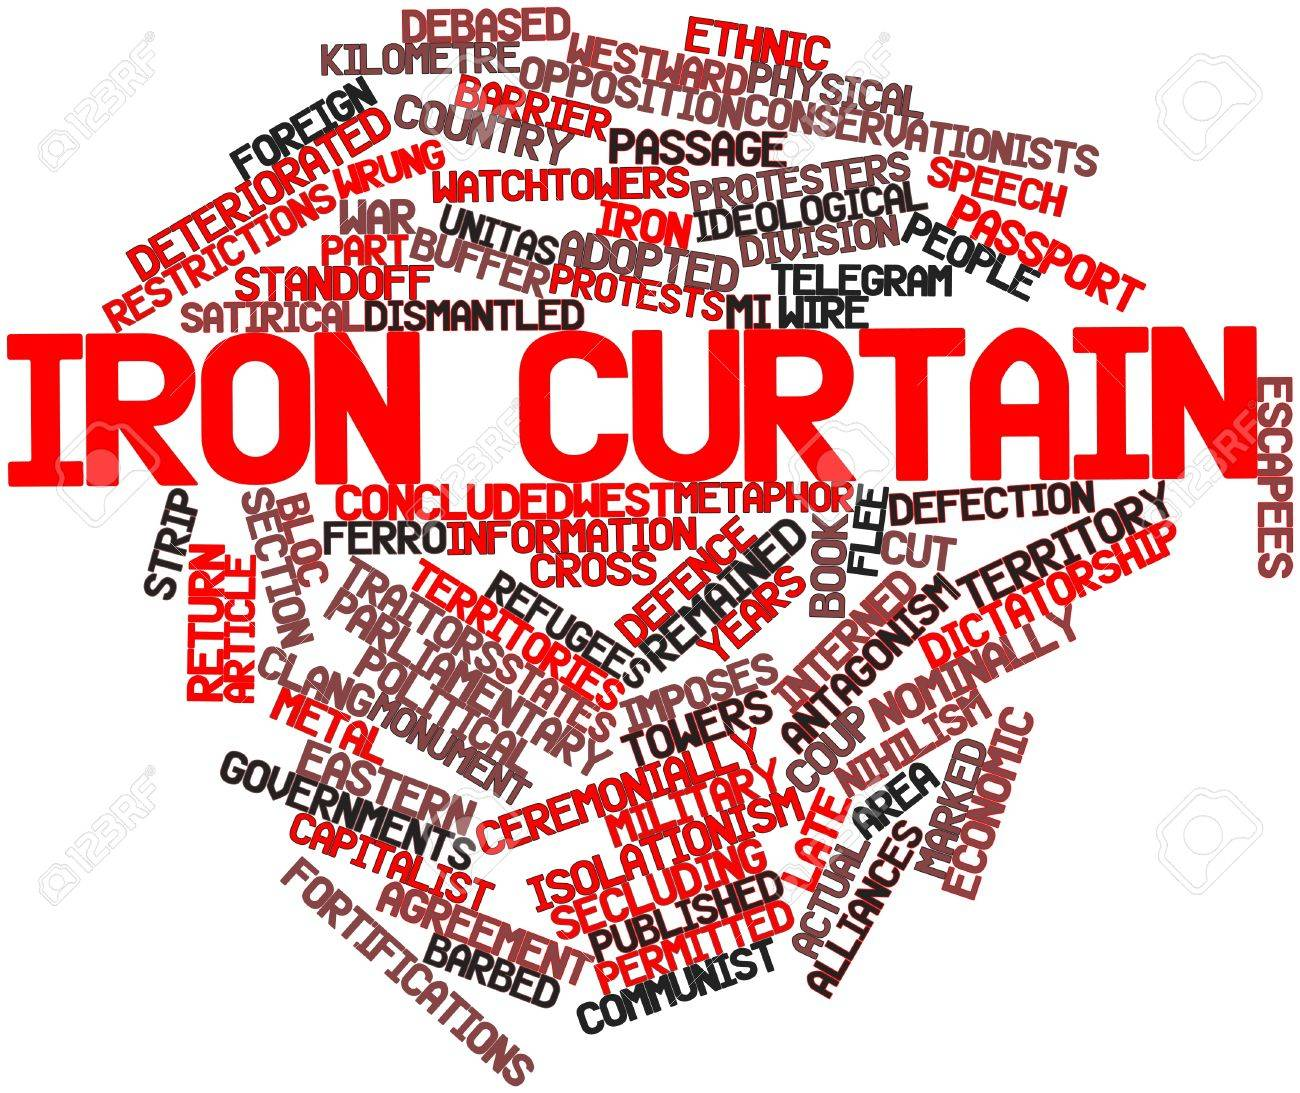 Churchill iron curtain speech cartoon - Text Of Iron Curtain Speech Download